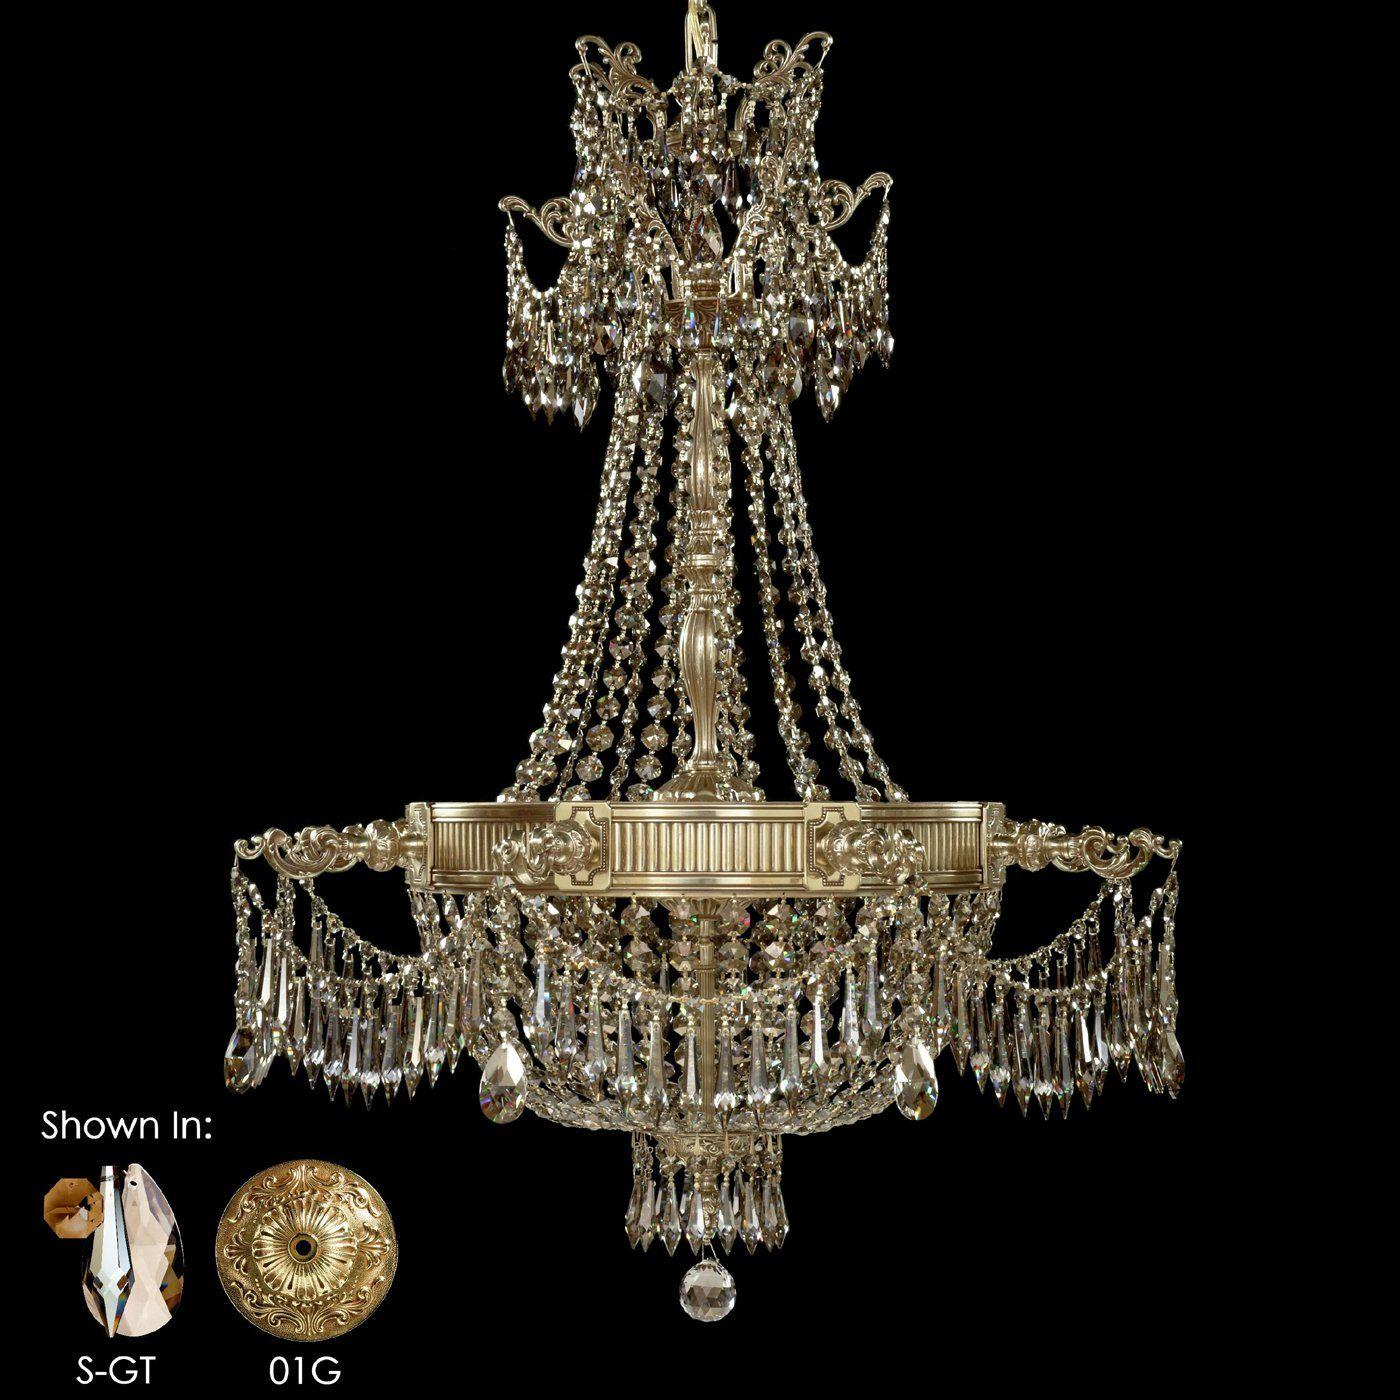 American brass ch 8122 8 light valencia chandelier atg stores american brass ch 8122 8 light valencia chandelier atg stores arubaitofo Choice Image